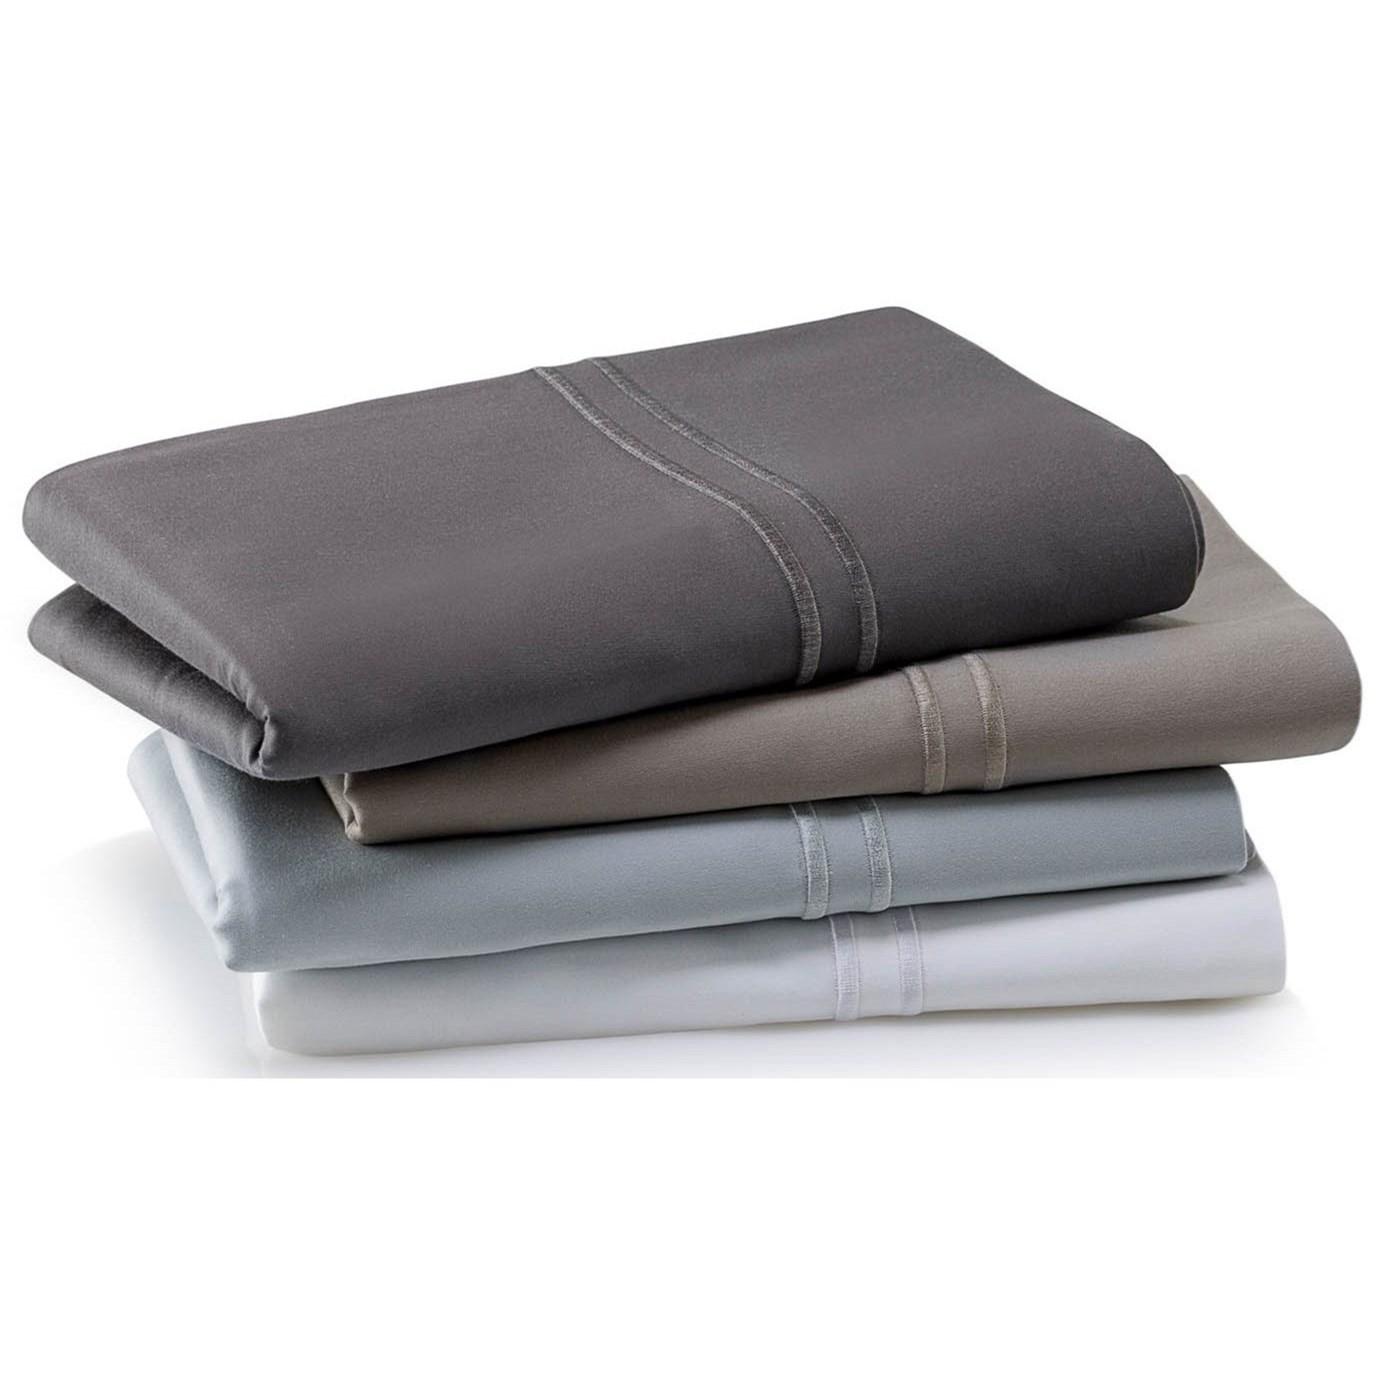 Malouf Supima Cotton Supima Cotton Sheets Split King - Item Number: MAS6SKFLSS